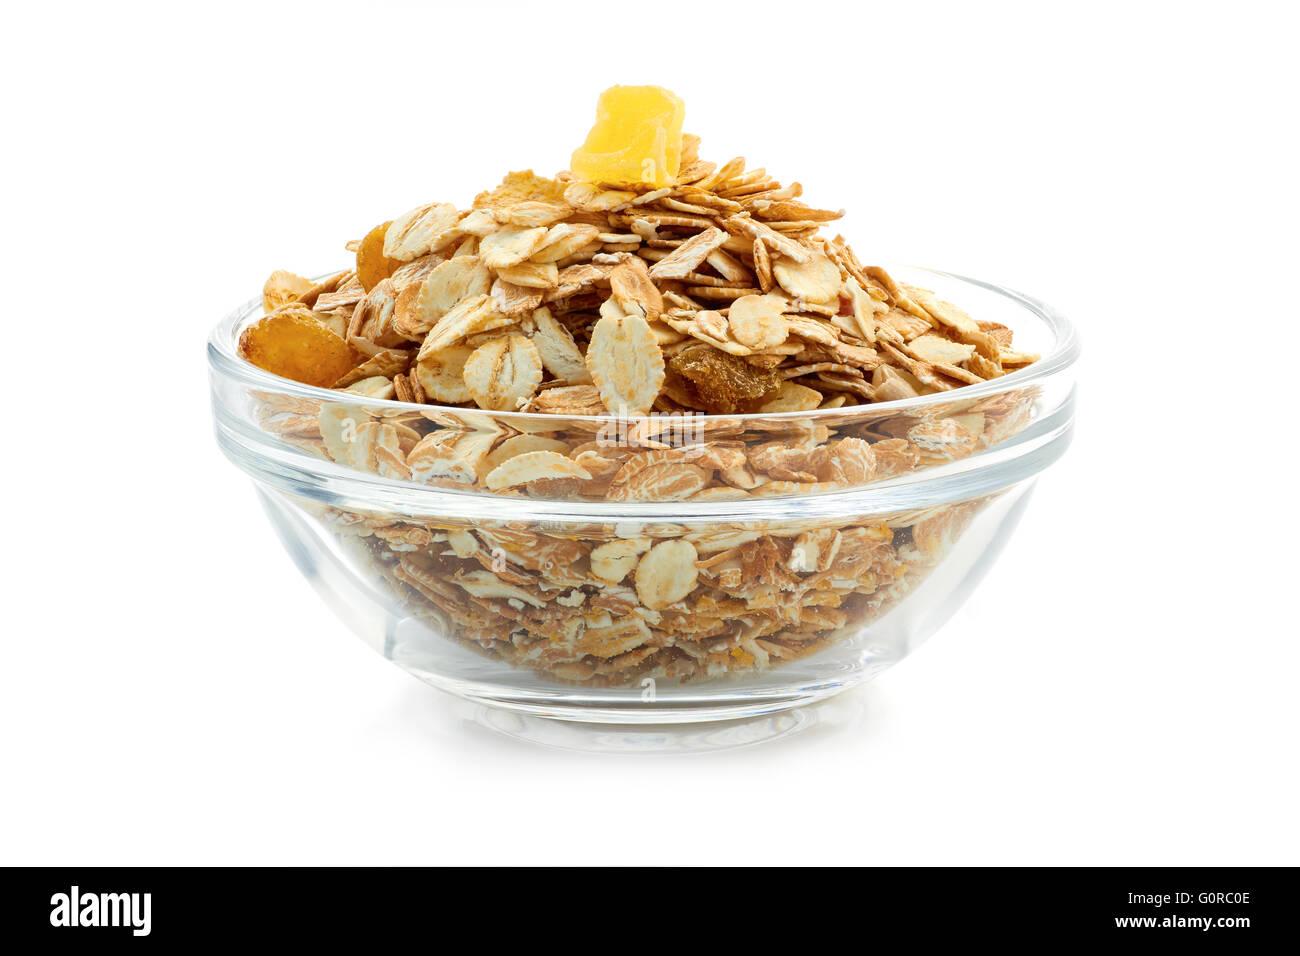 Muesli breakfast in glass bowl on white background Stock Photo